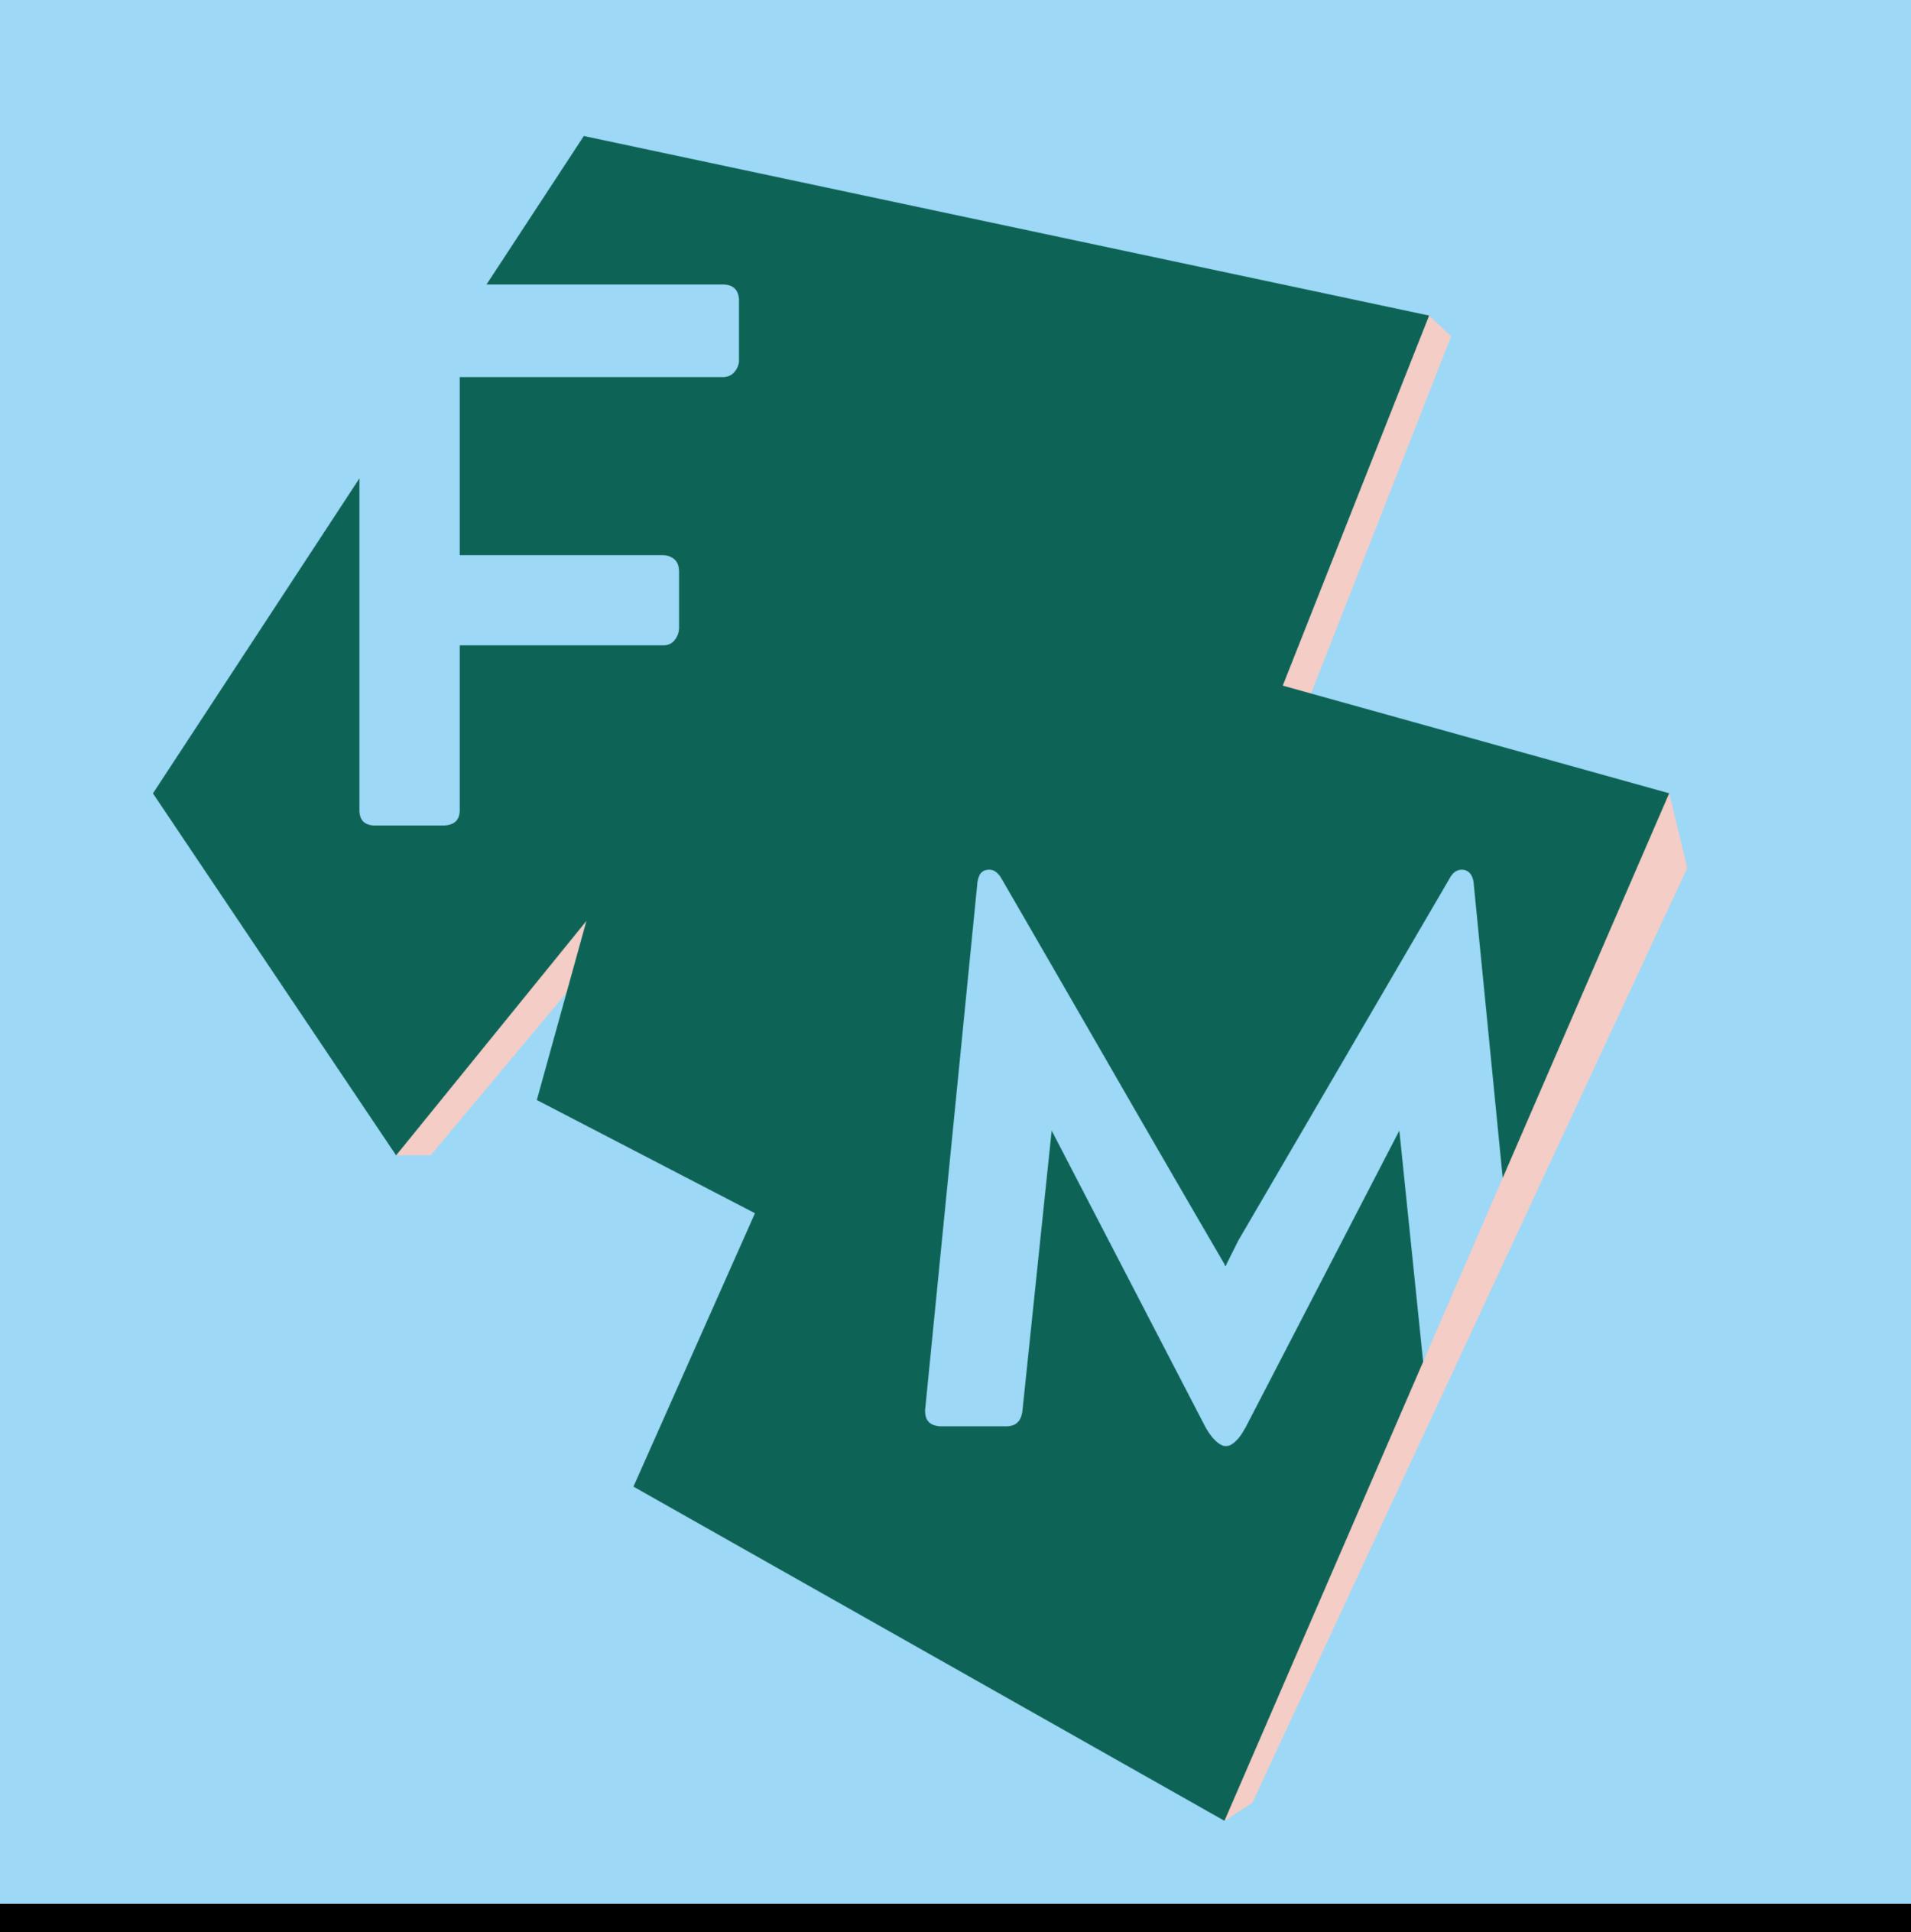 fm-logo3.png